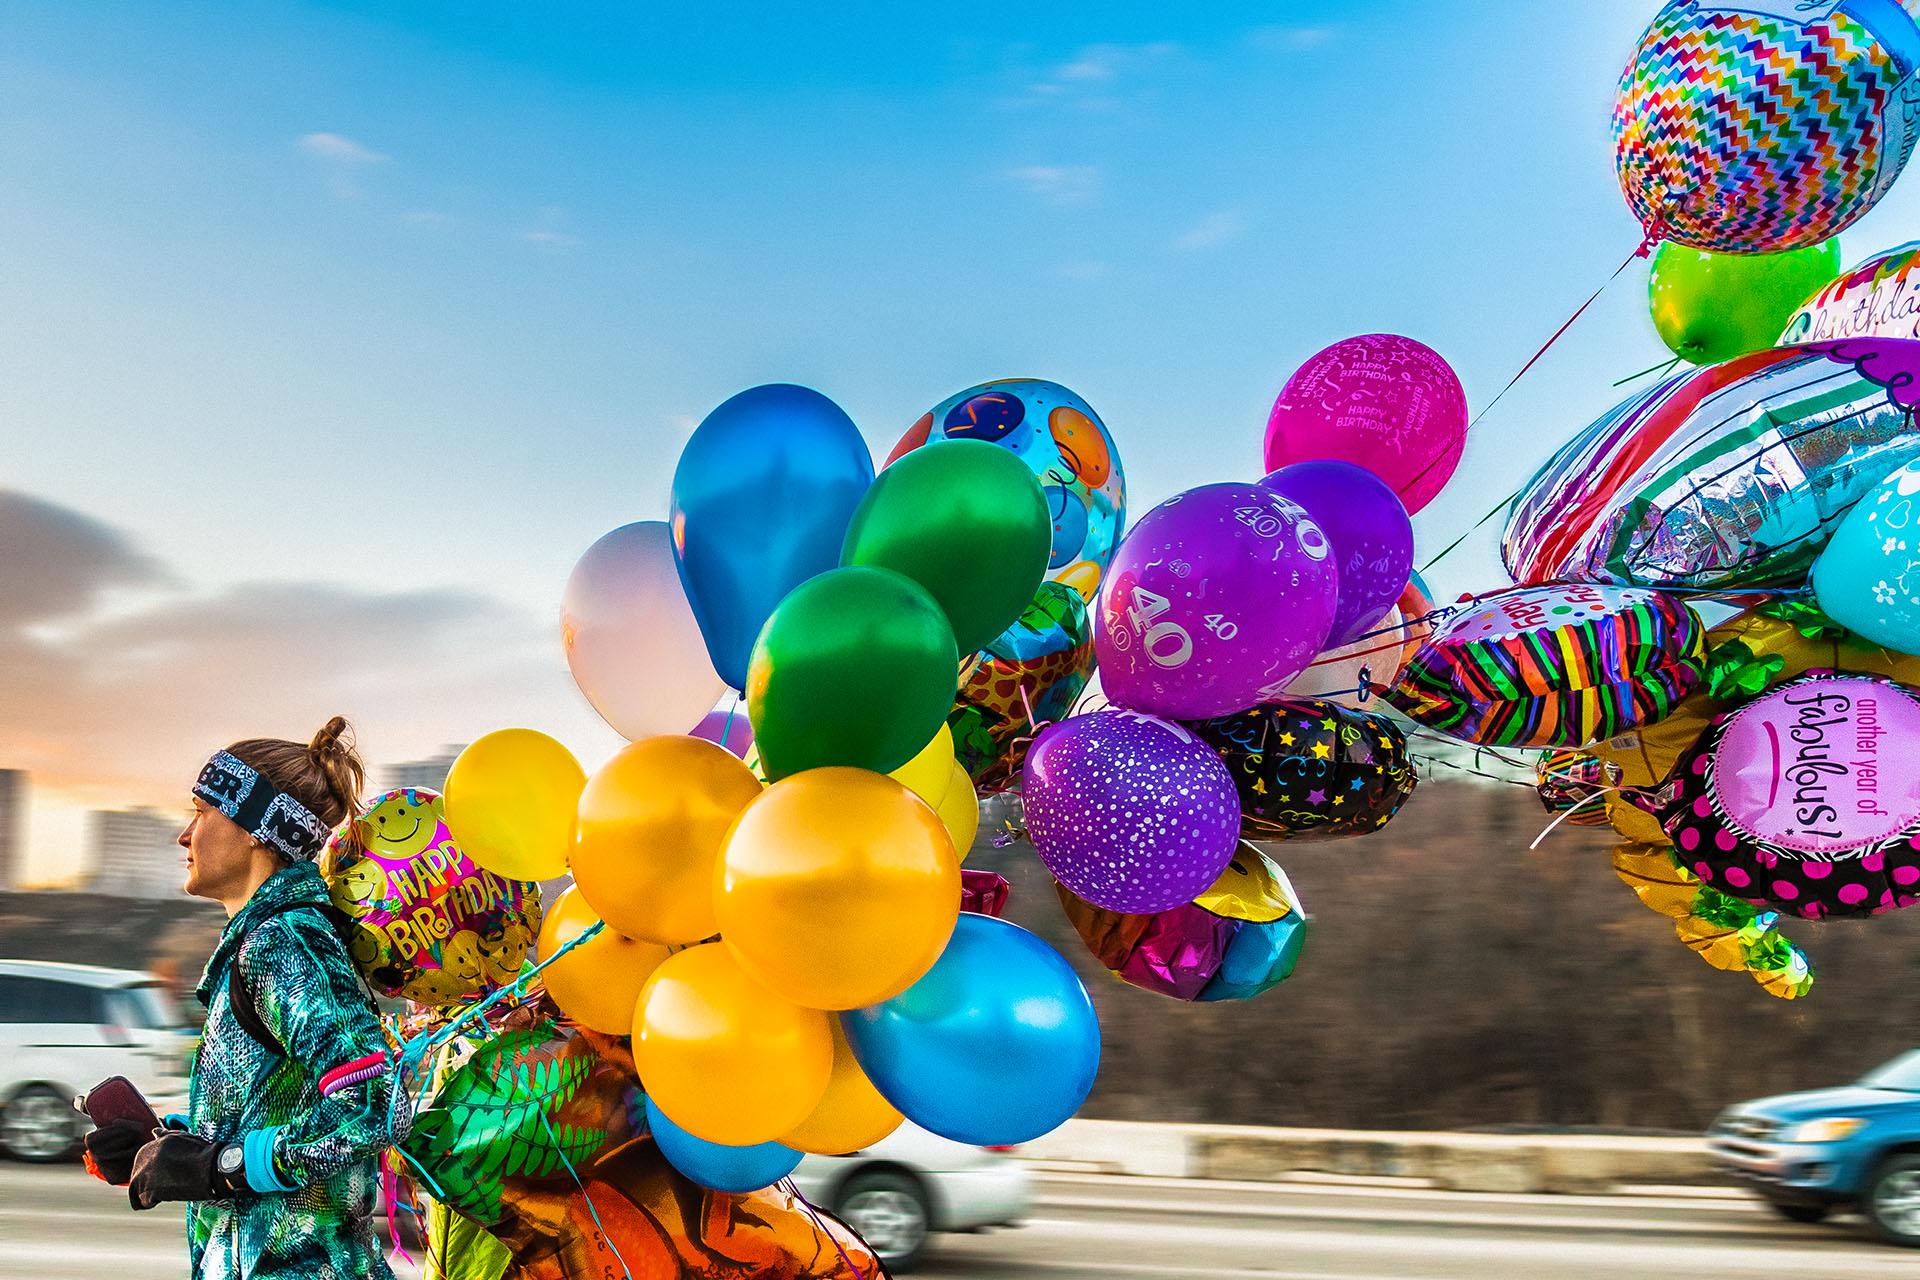 jen-ballons-small copy.jpg